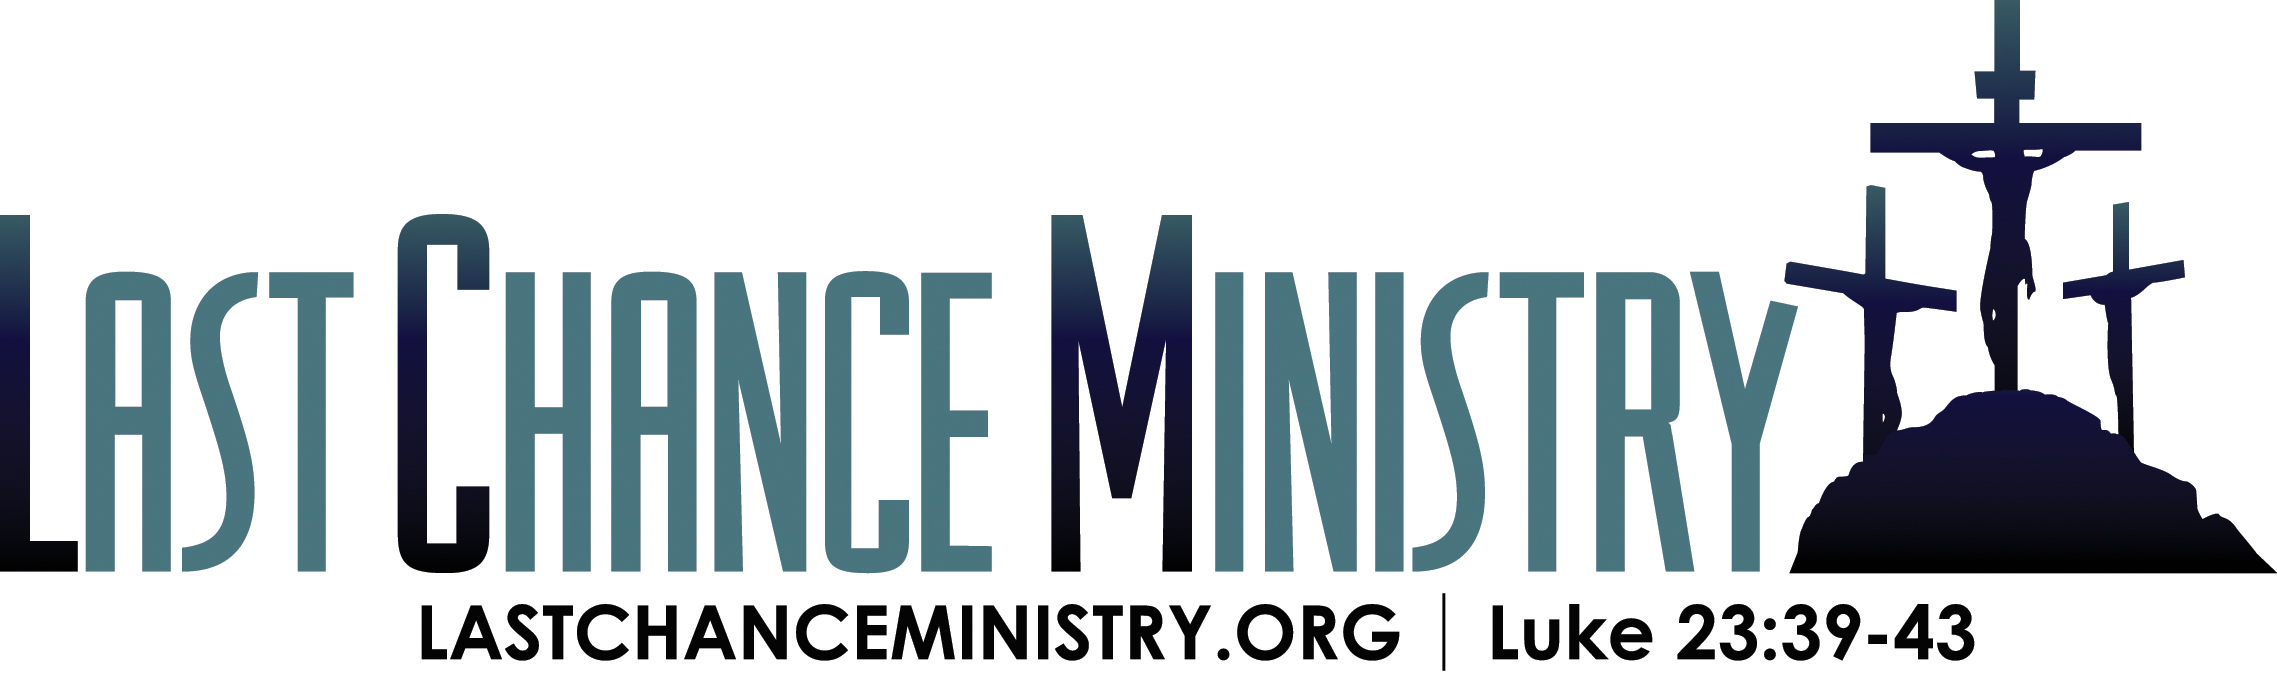 Last Chance Ministry.jpg